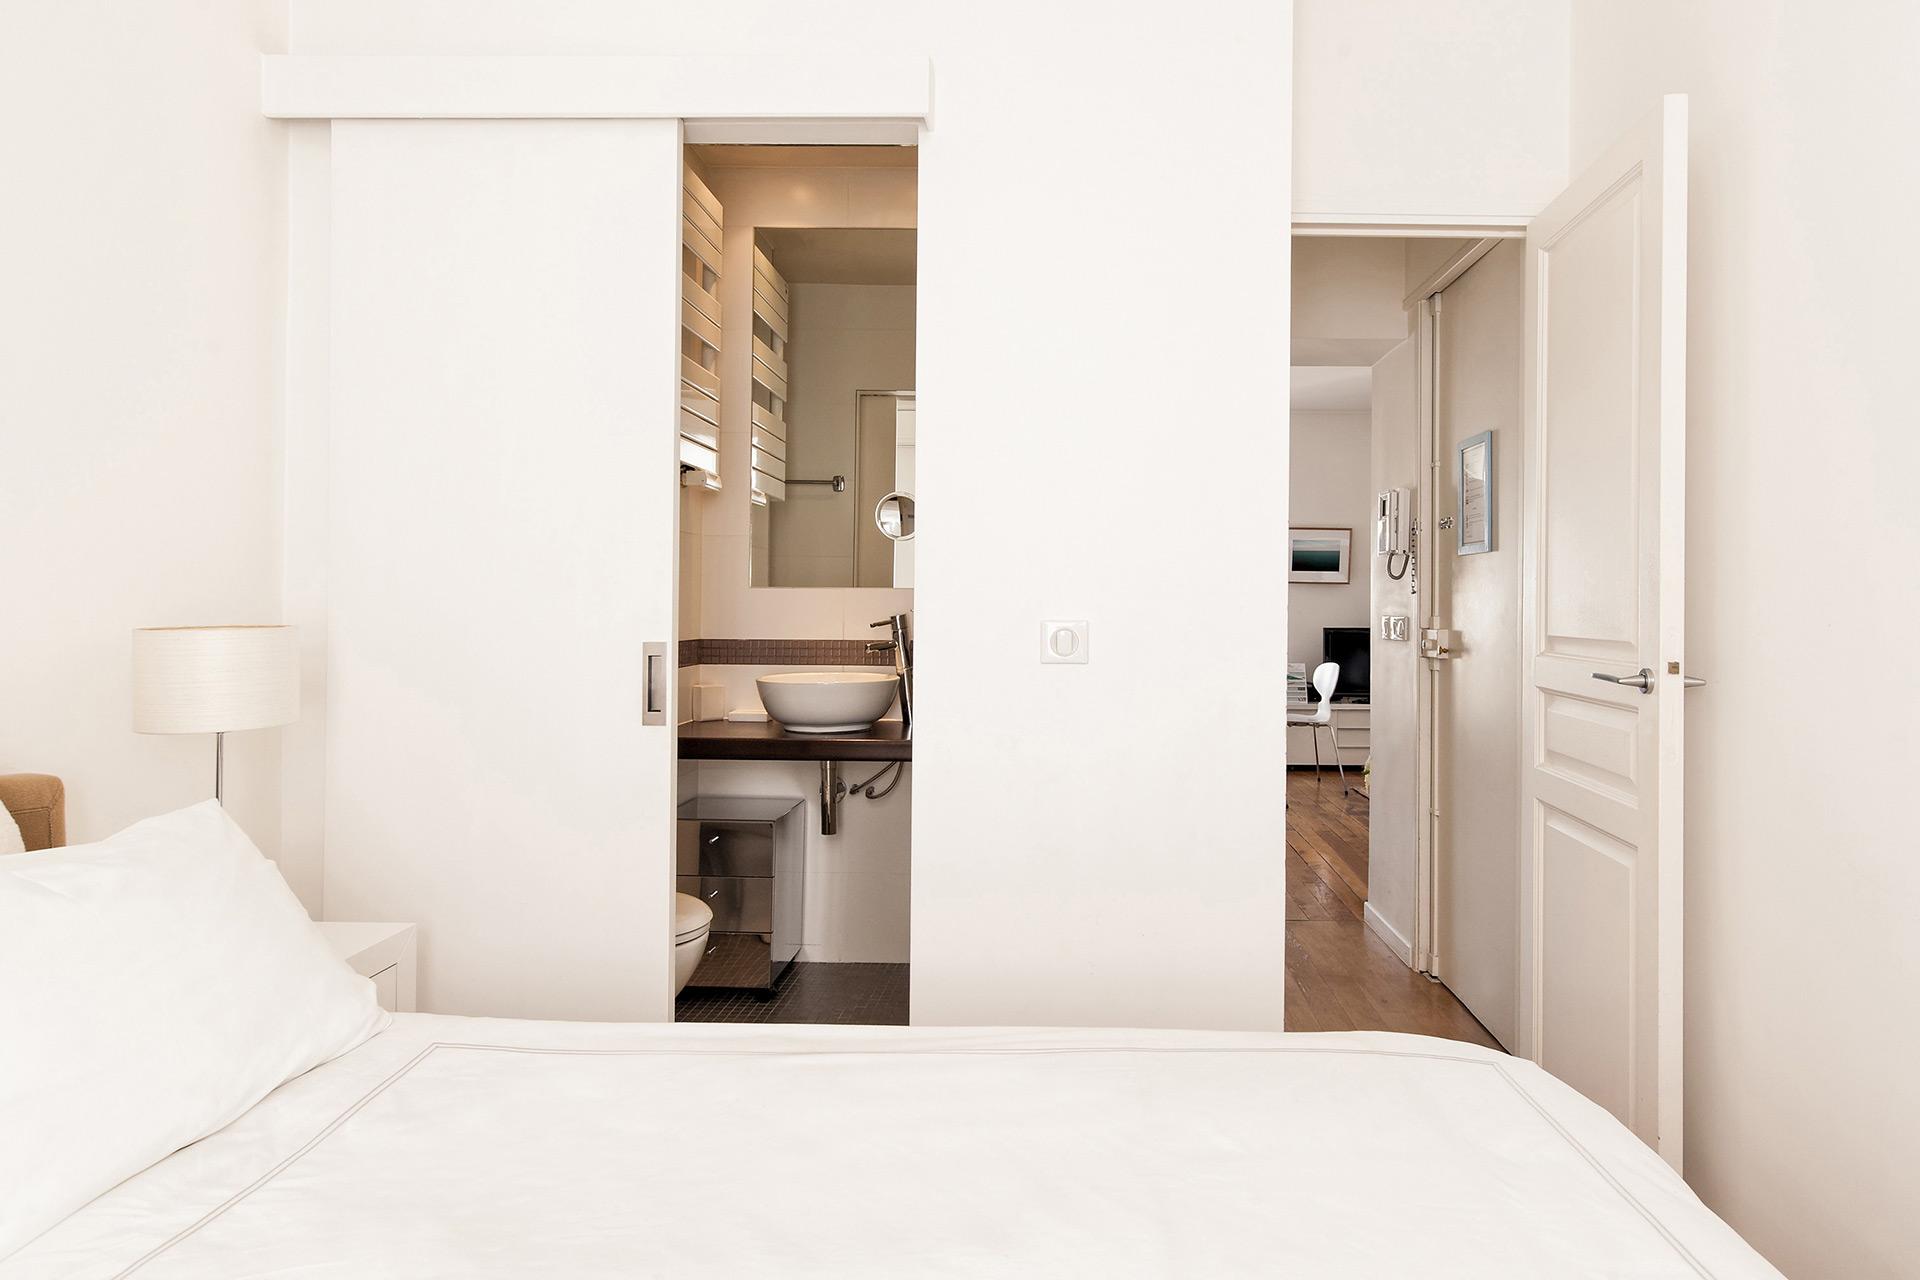 En Suite Bathrooms In Apartments: Find 1 Bedroom Apartment In Paris France